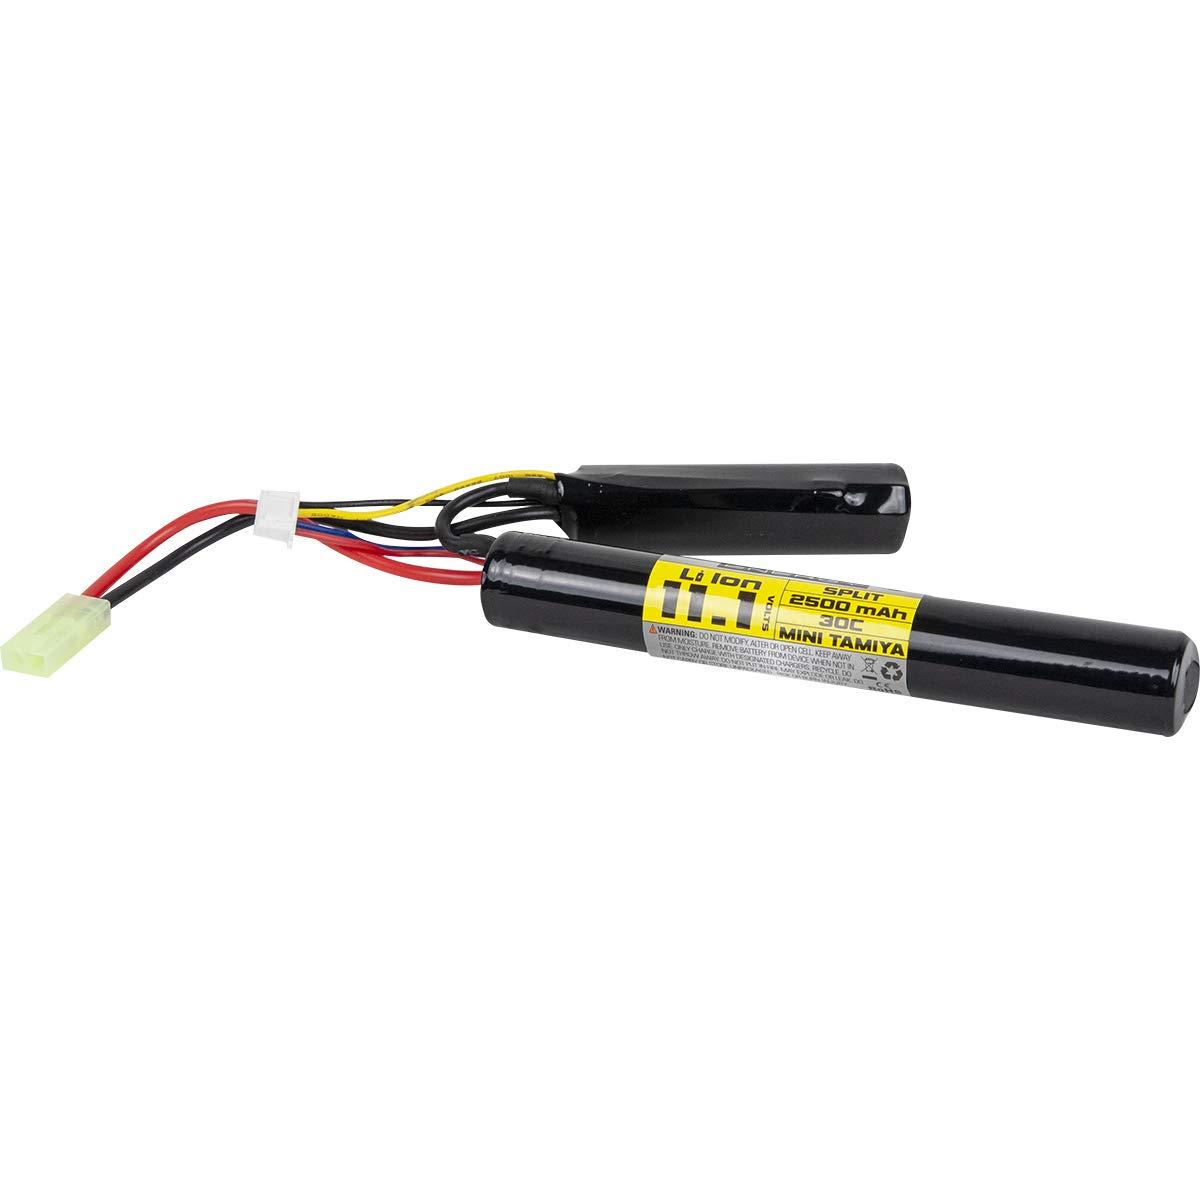 Valken Airsoft Battery - Li-Ion 11.1V 2500mAh Split Style(High Output)